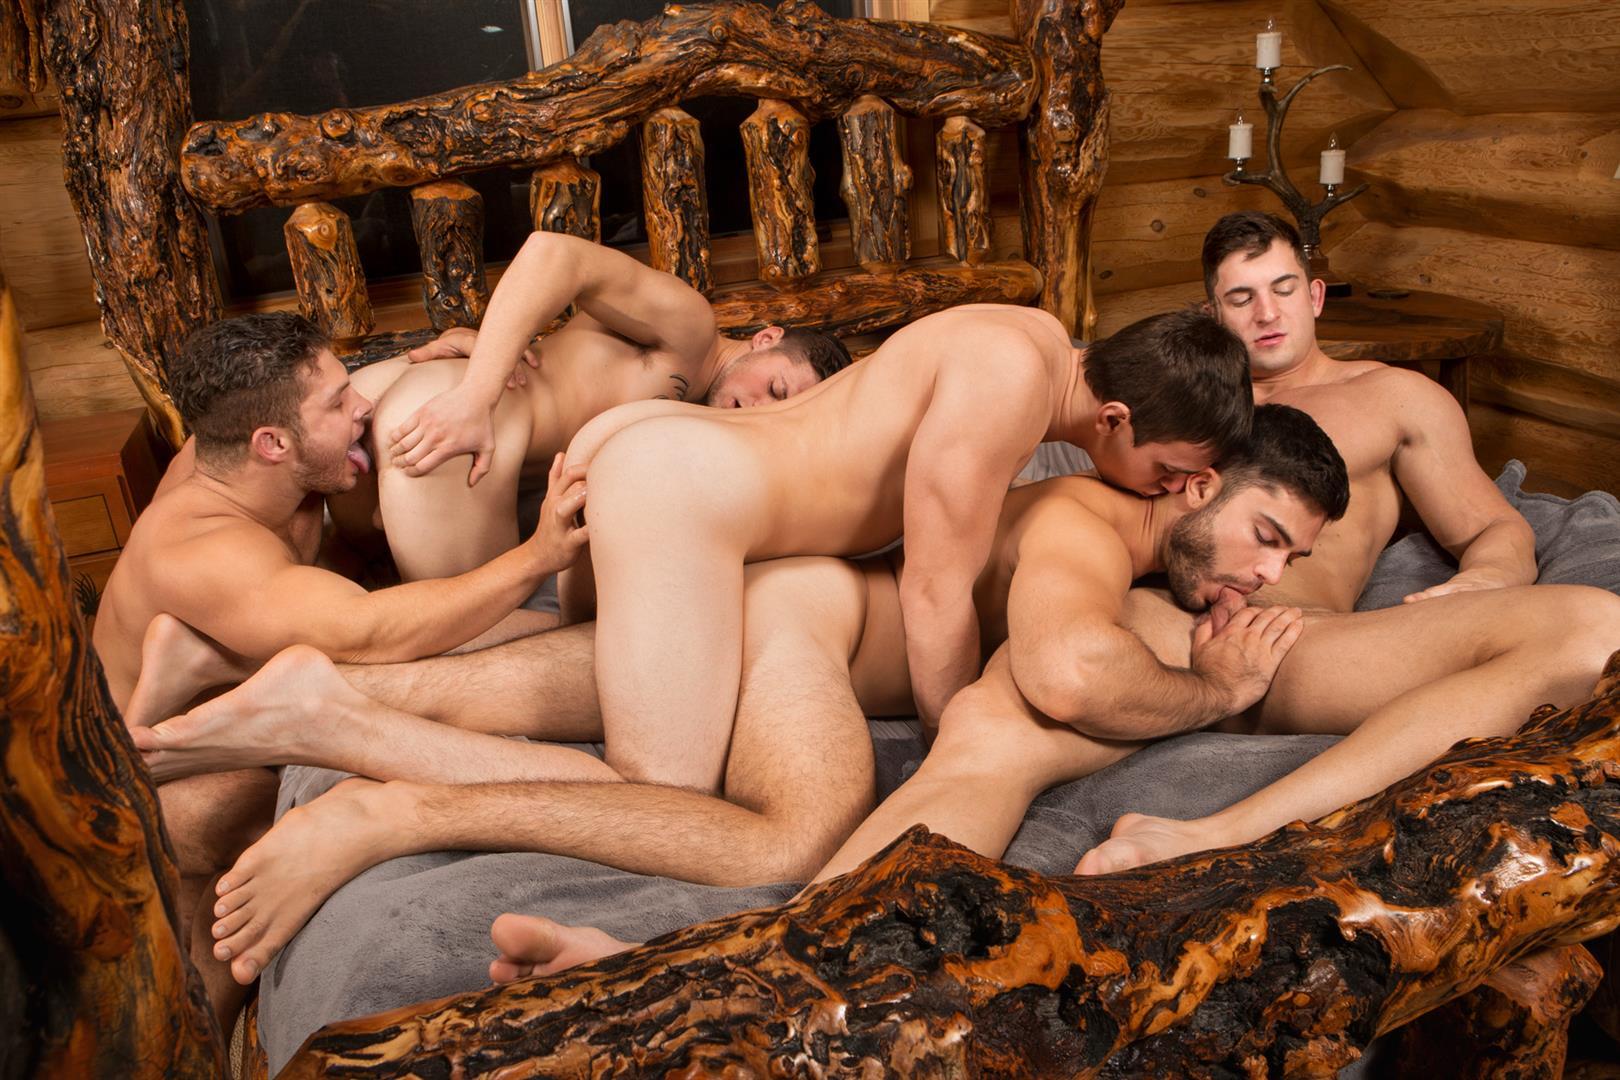 Sean-Cody-Winter-Getaway-Day-1-Big-Dick-Hunks-Fucking-Bareback-Amateur-Gay-Porn-11 Sean Cody Takes The Boys On A 8-Day Bareback Winter Getaway